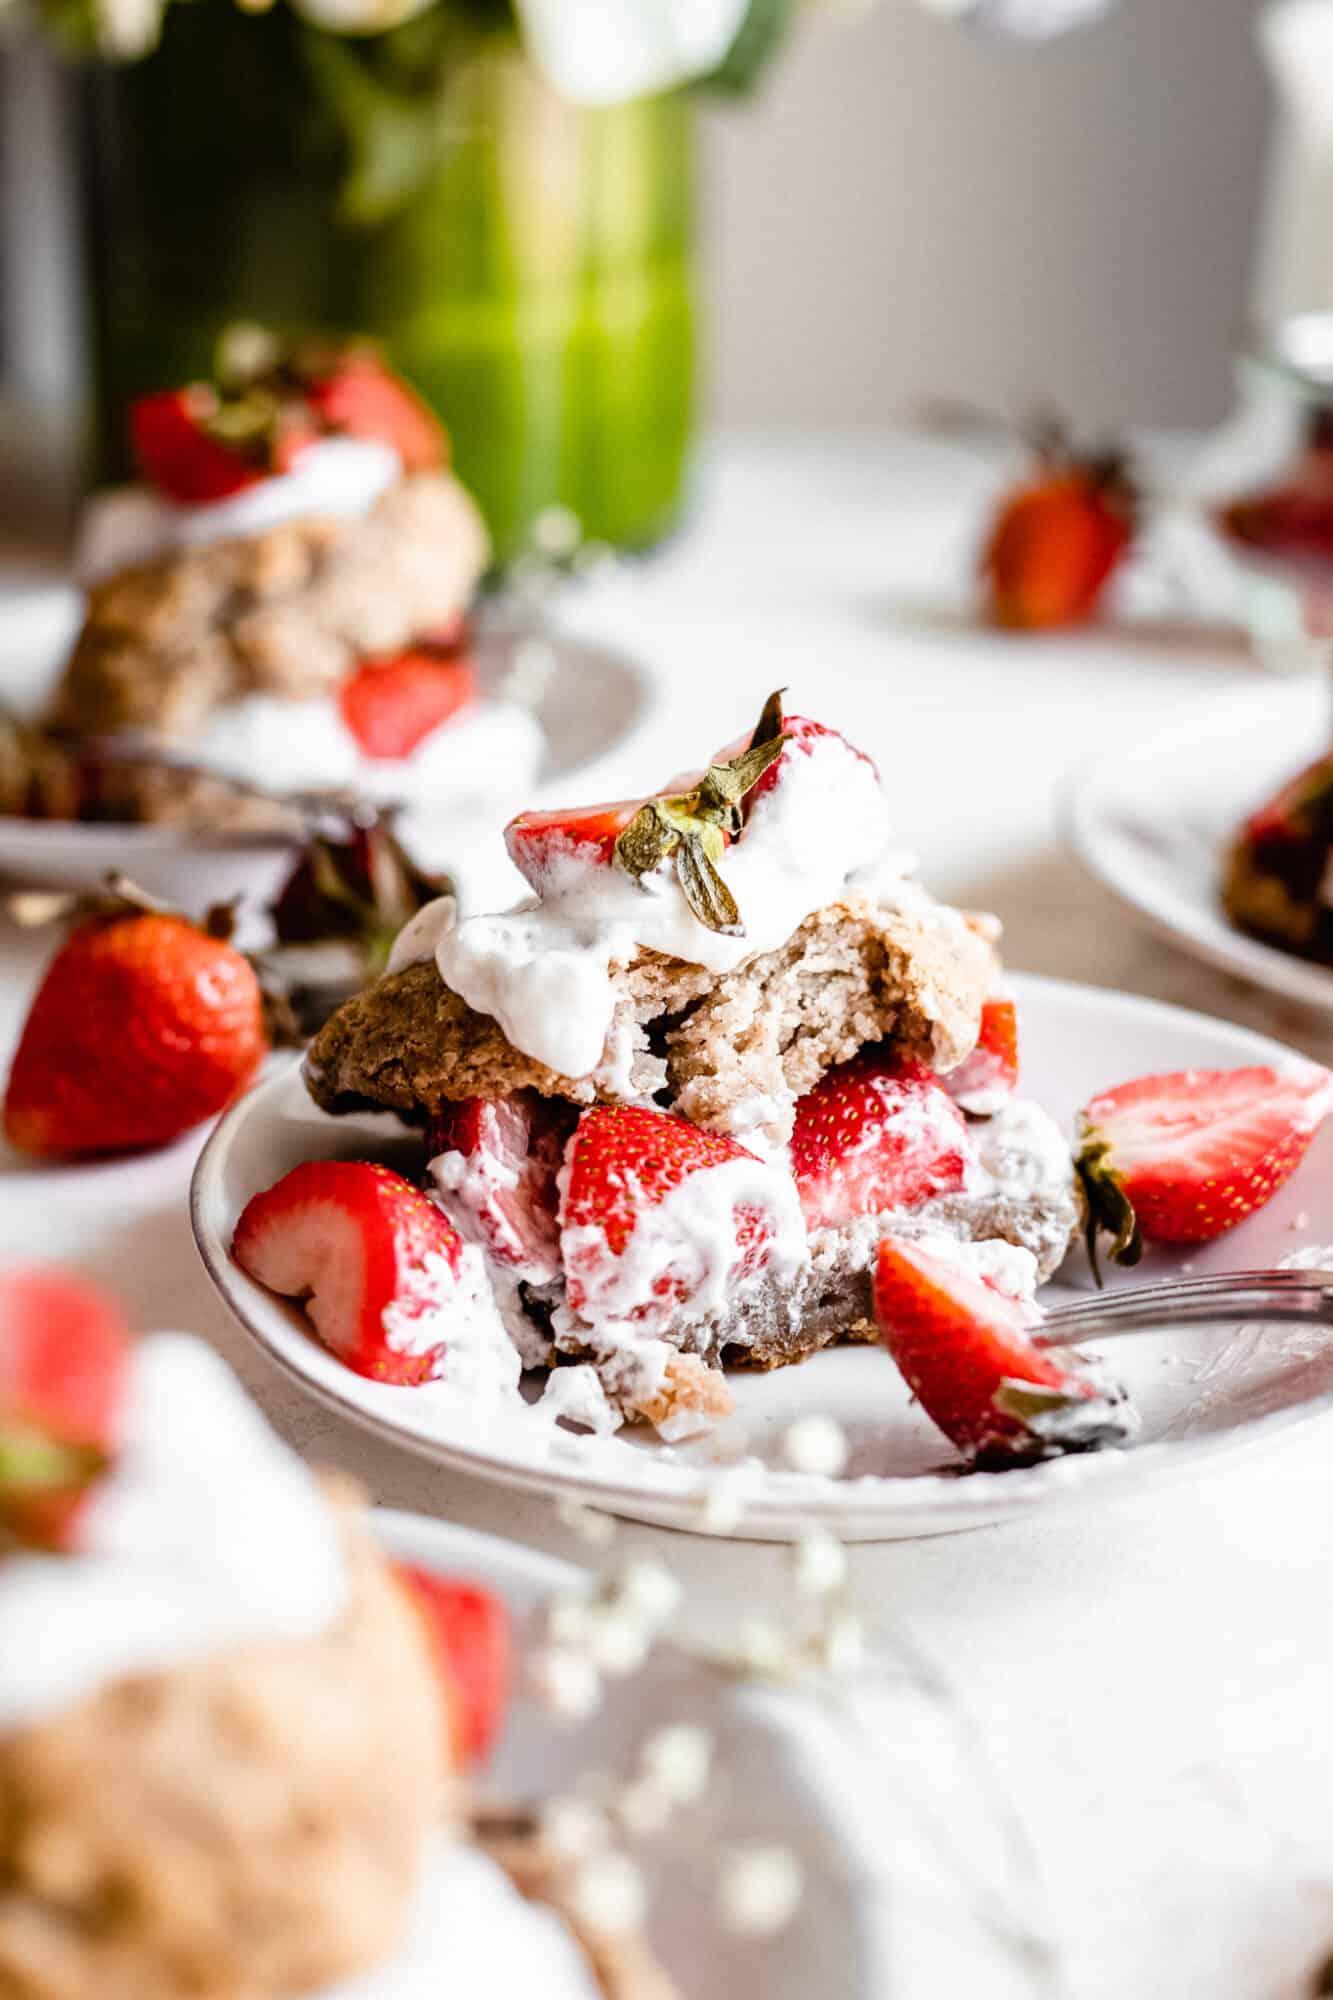 eaten vegan strawberry shortcake